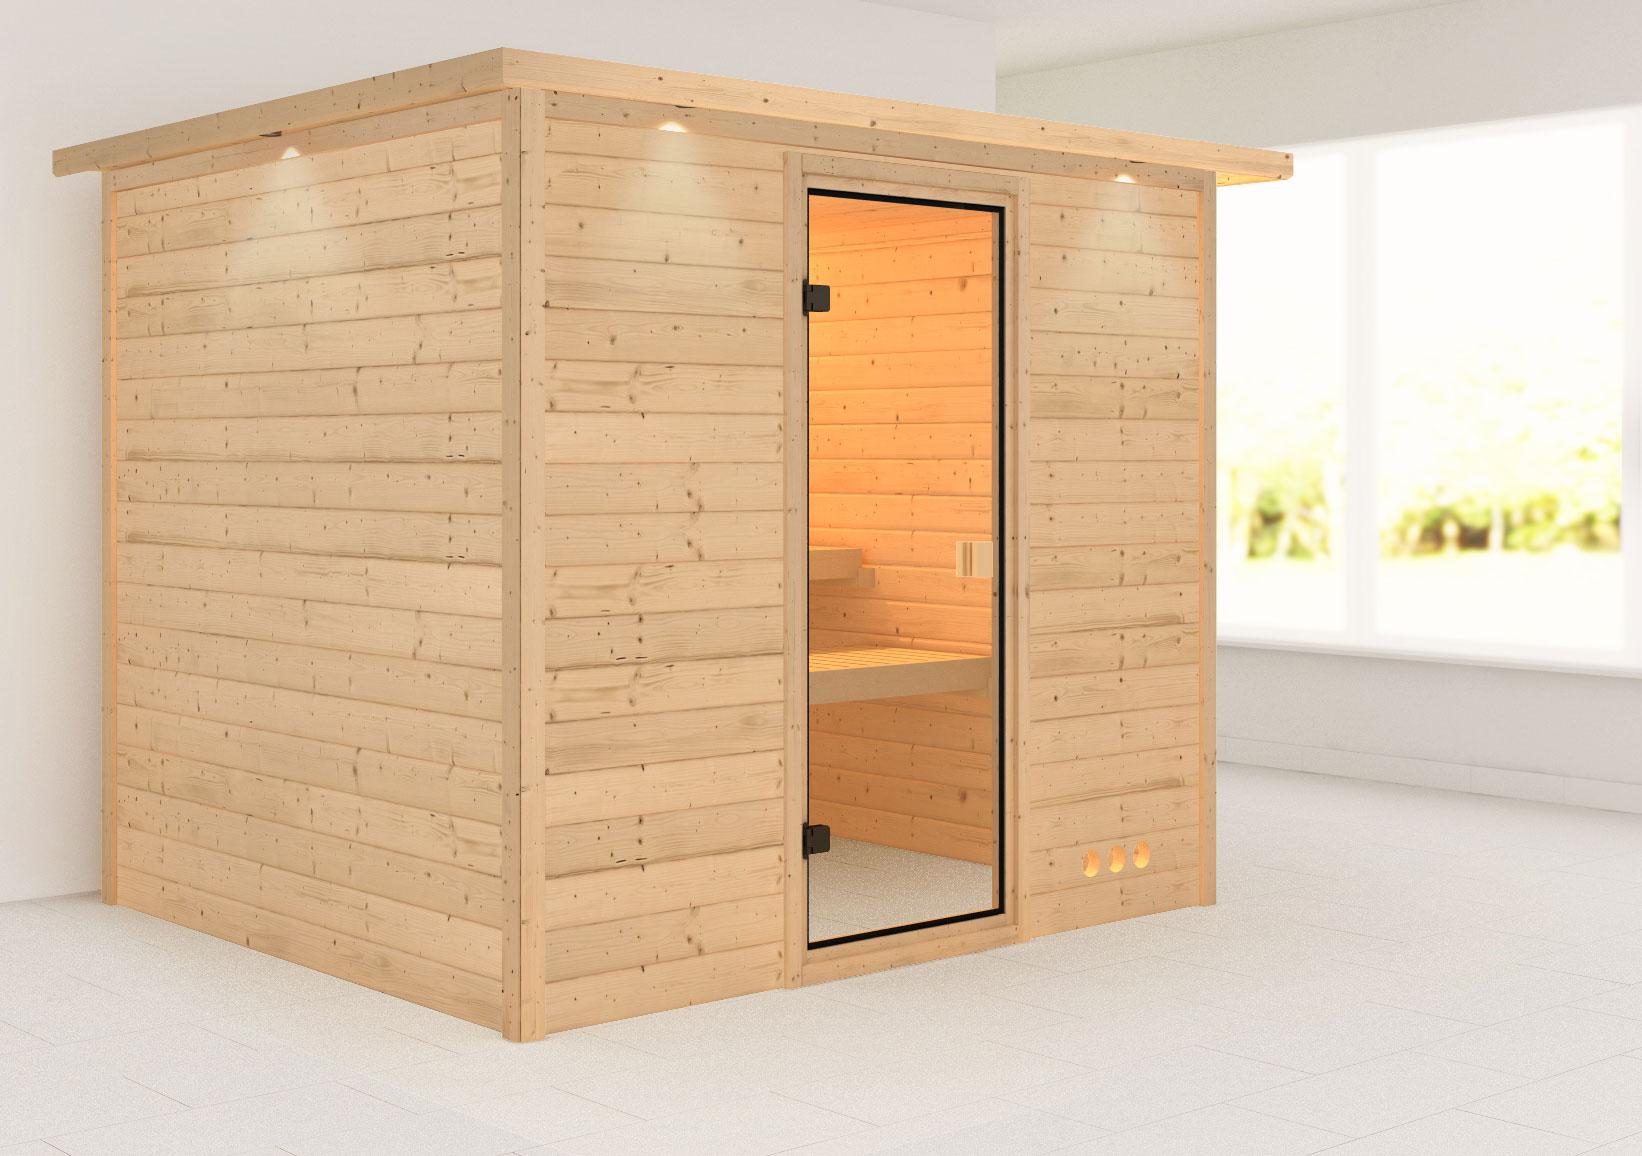 Woodfeeling Sauna Karla 38mm Kranz ohne Ofen Tür Classic Bild 1